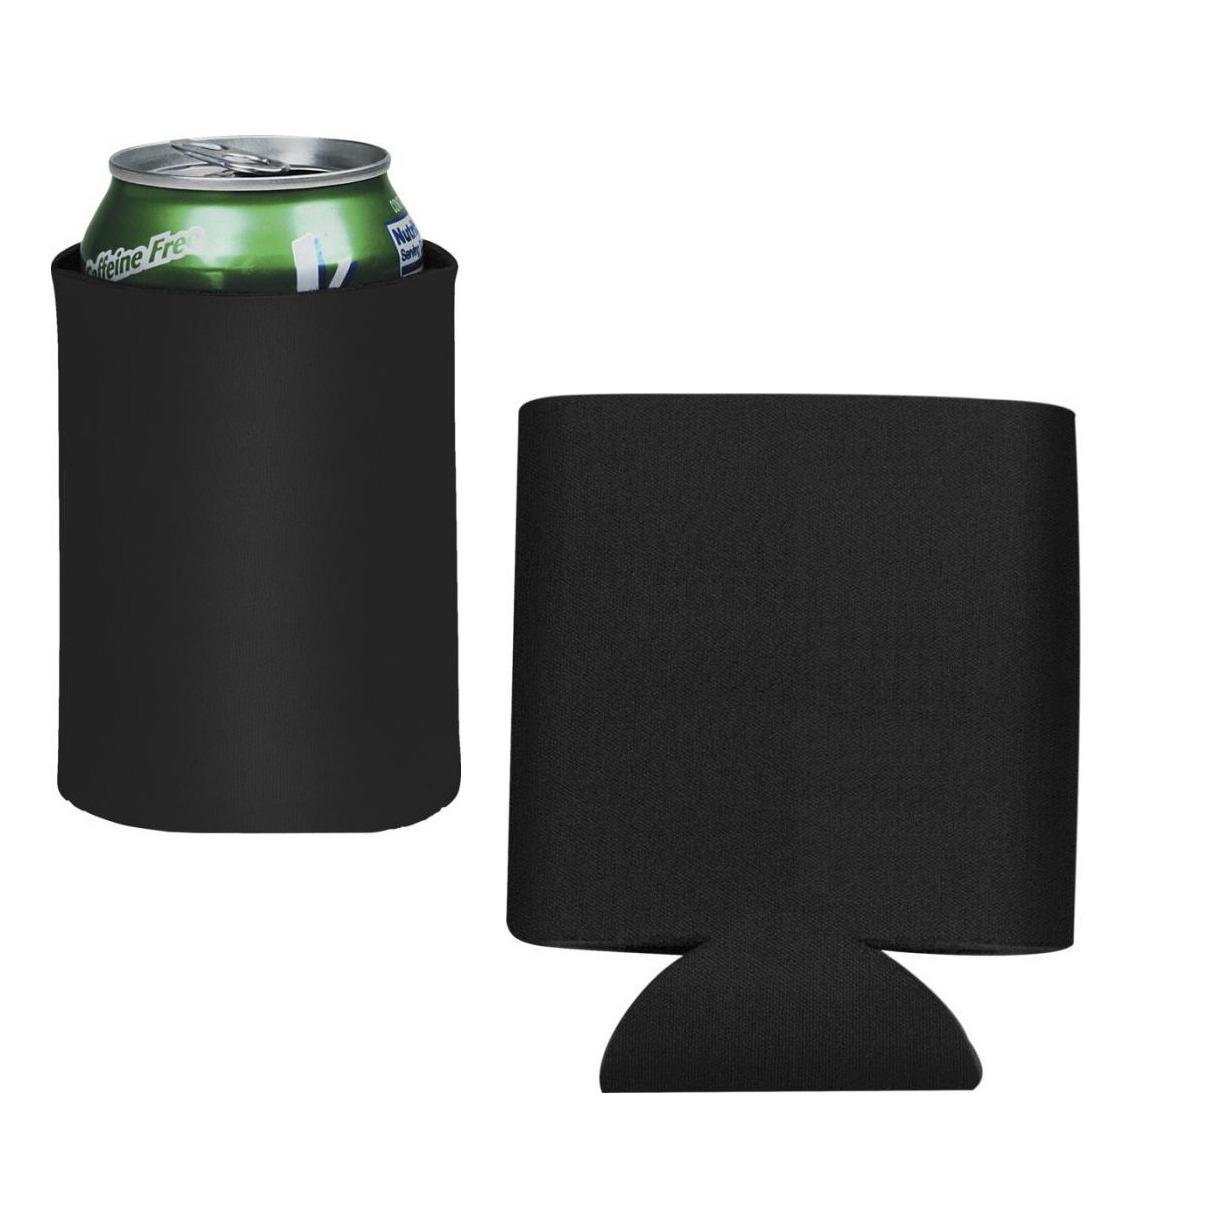 Voordeelset 10x Stuks opvouwbare zwarte blikjeskoelers/ koel hoesjes